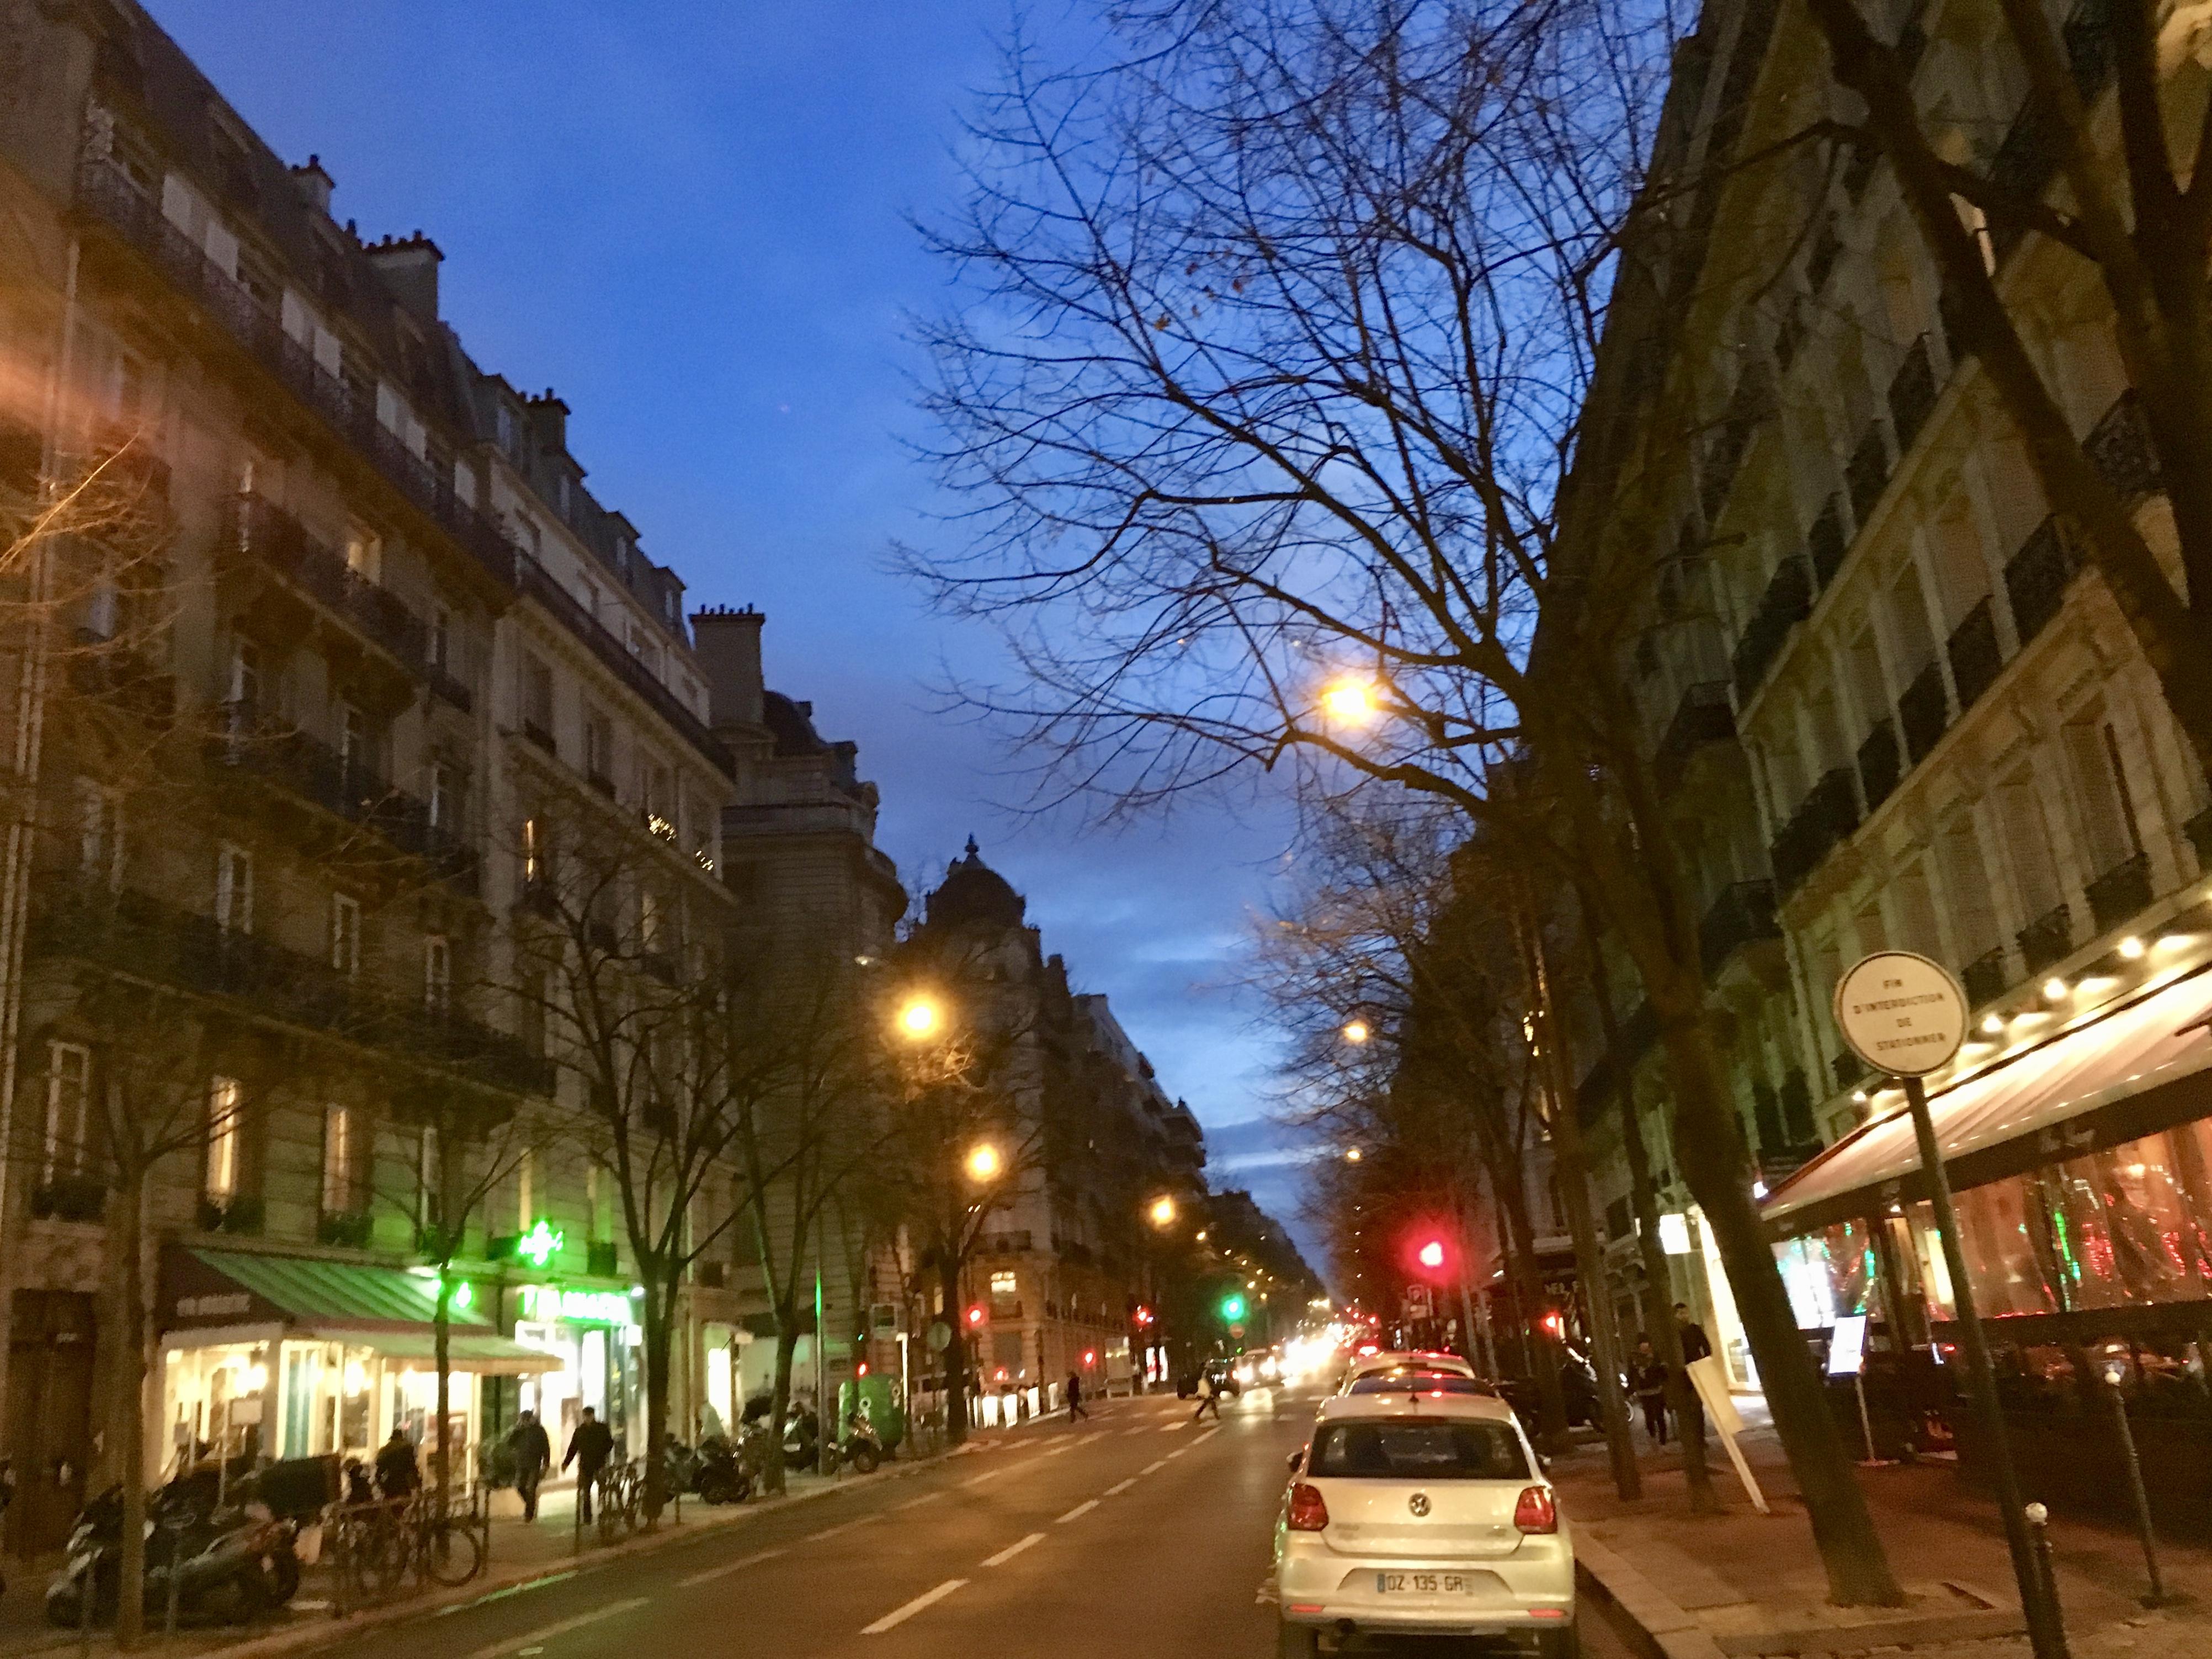 Haiku: Random Street in the City of Lights at Dusk